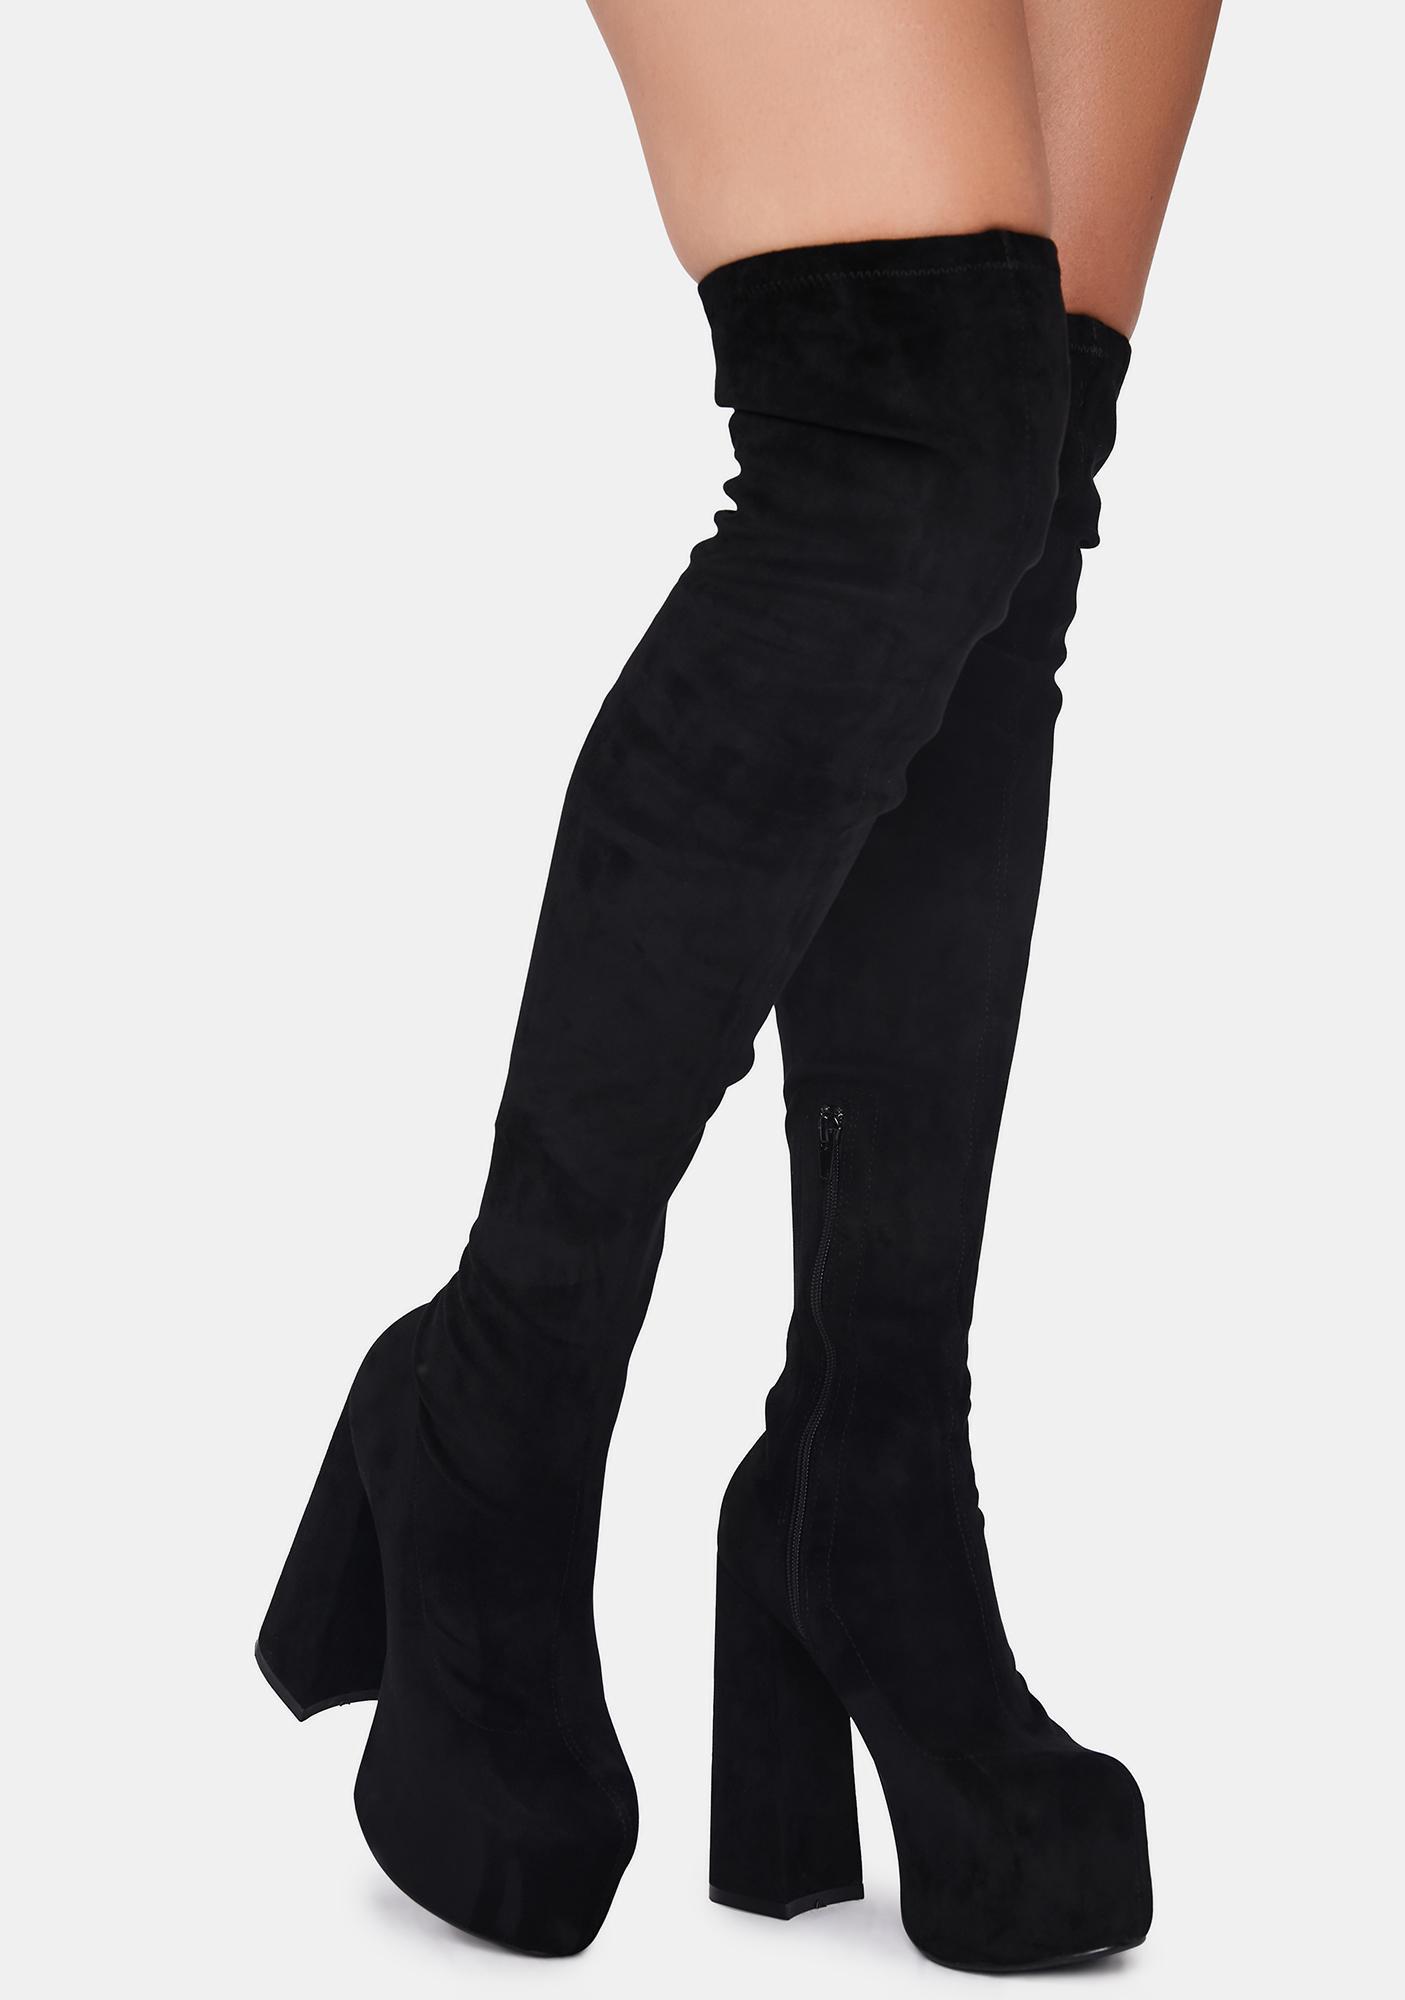 Lemon Drop by Privileged Black Suede Havasu Knee High Boots